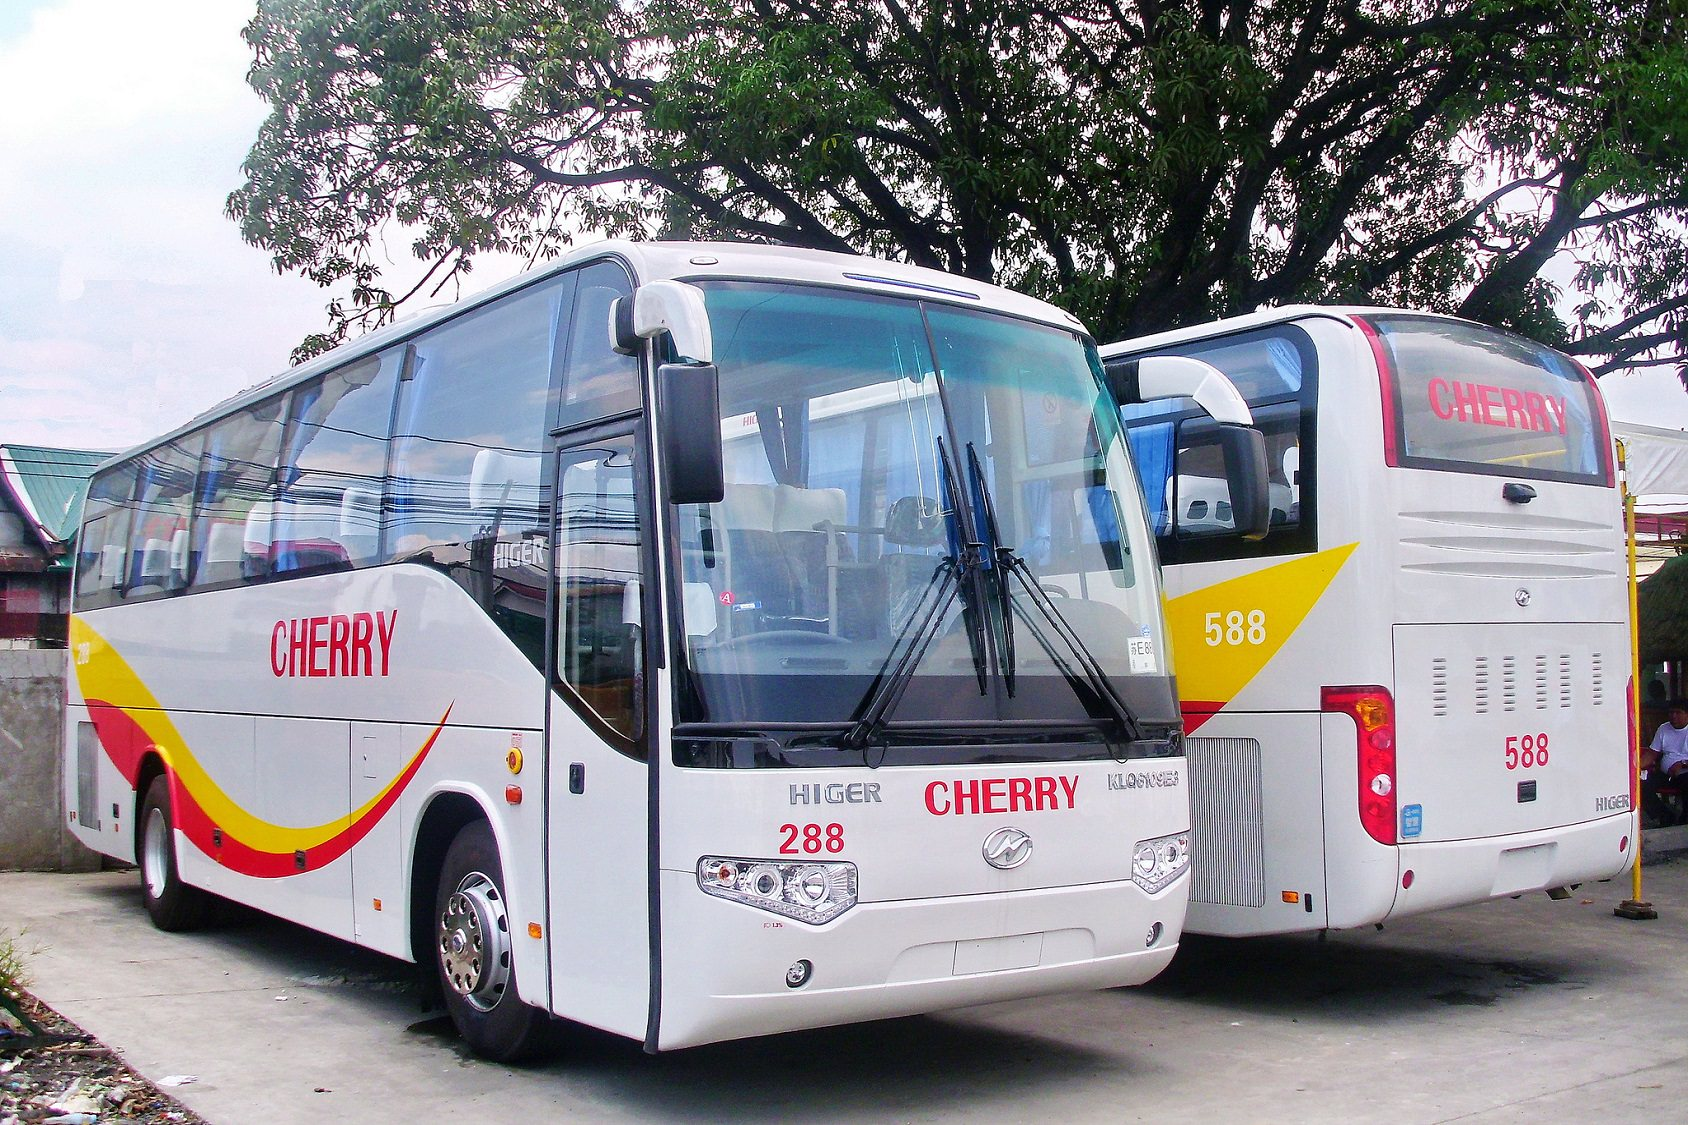 Palawan Bus Tickets, Palawan Bus Service, Bus Puerto Princesa El Nido